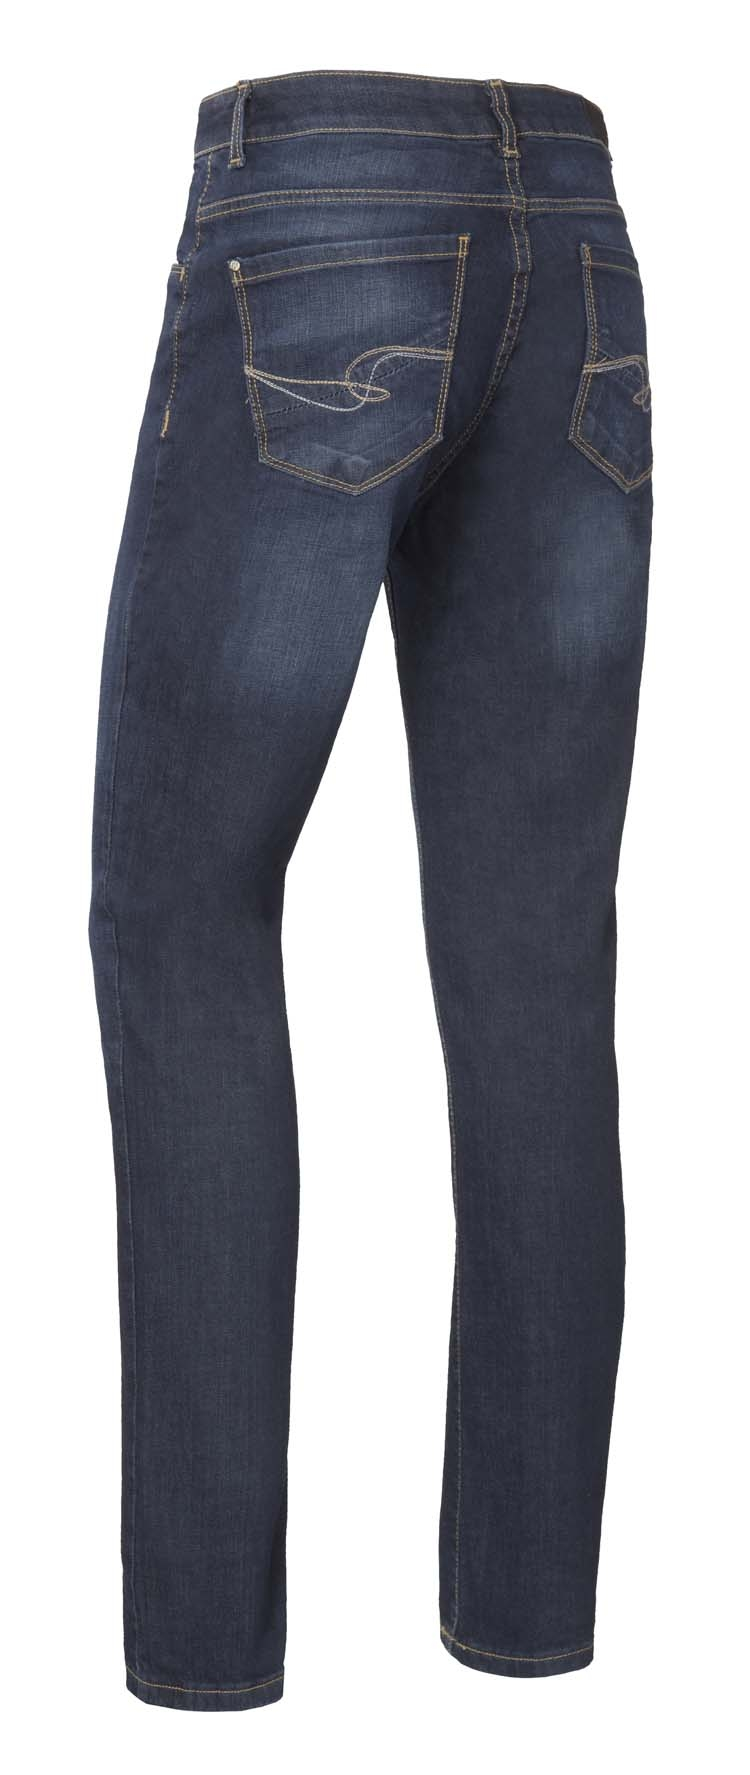 "Brams Paris stretch jeans  "" Lily ""  Dark used"